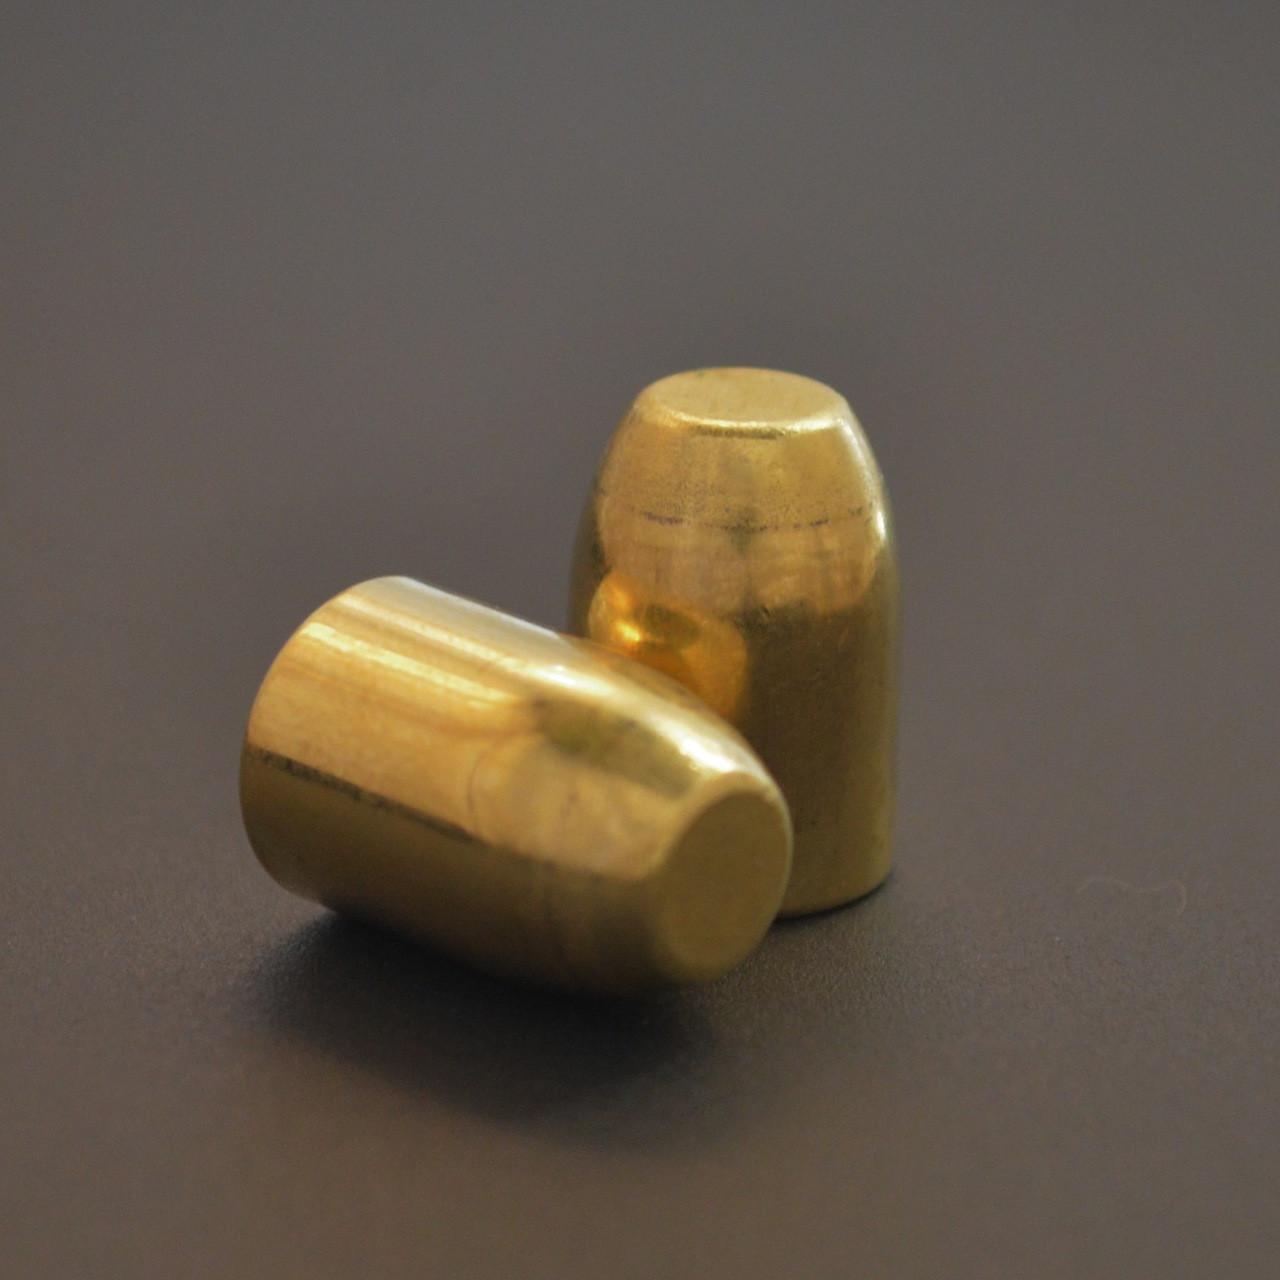 10mm/.40 180gr FMJ - 1,000ct